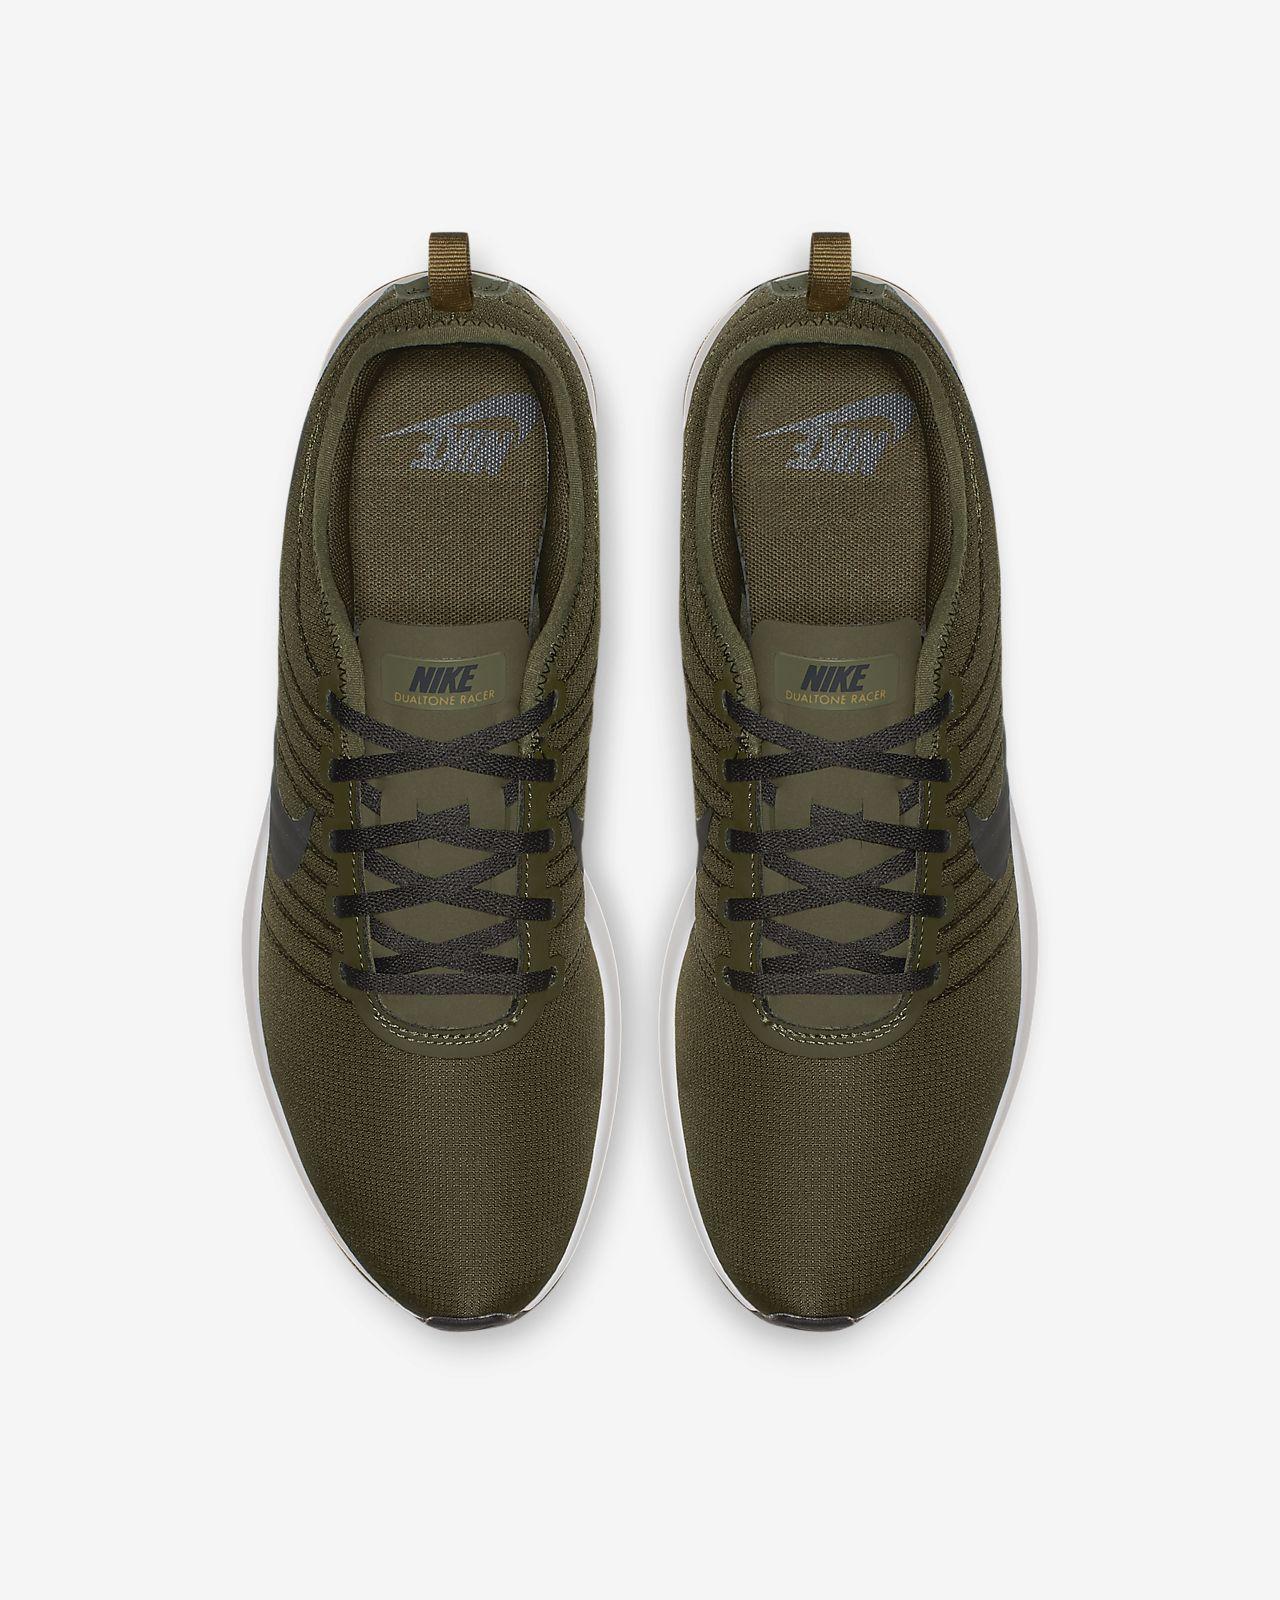 designer fashion dd097 b8de1 ... Sko Nike Dualtone Racer för män